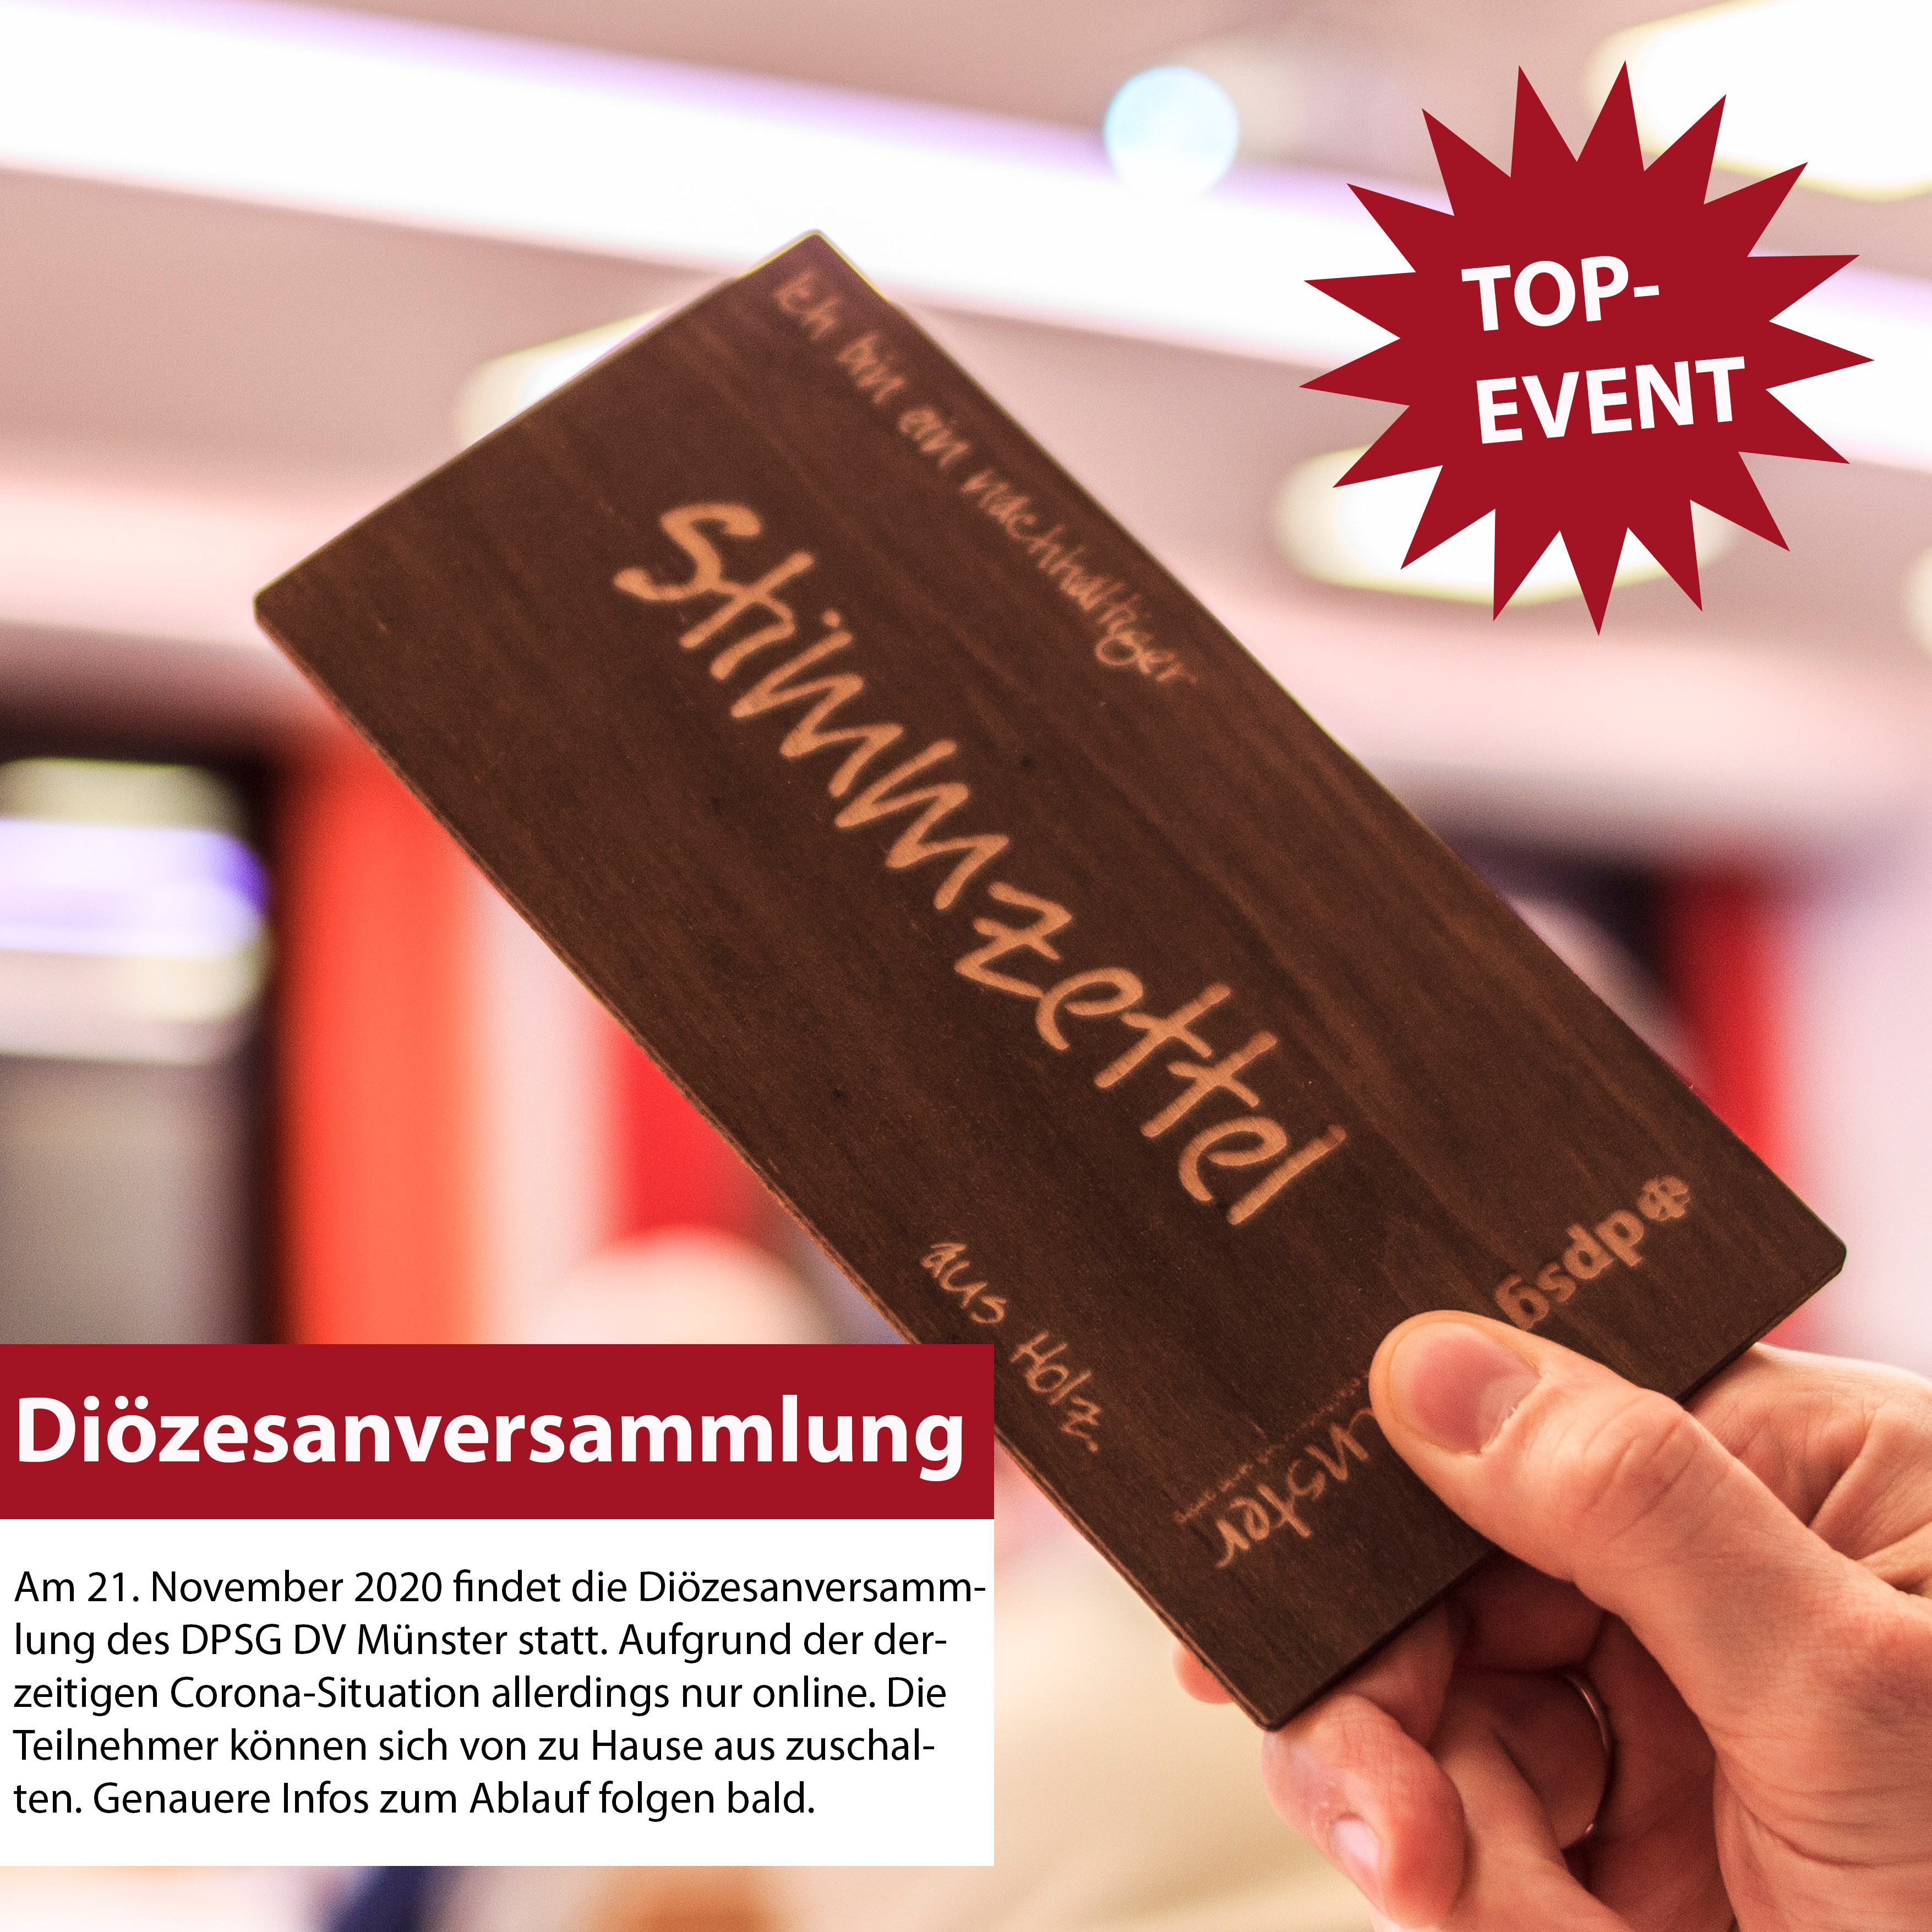 Top-Event_DV_2020-online.jpg